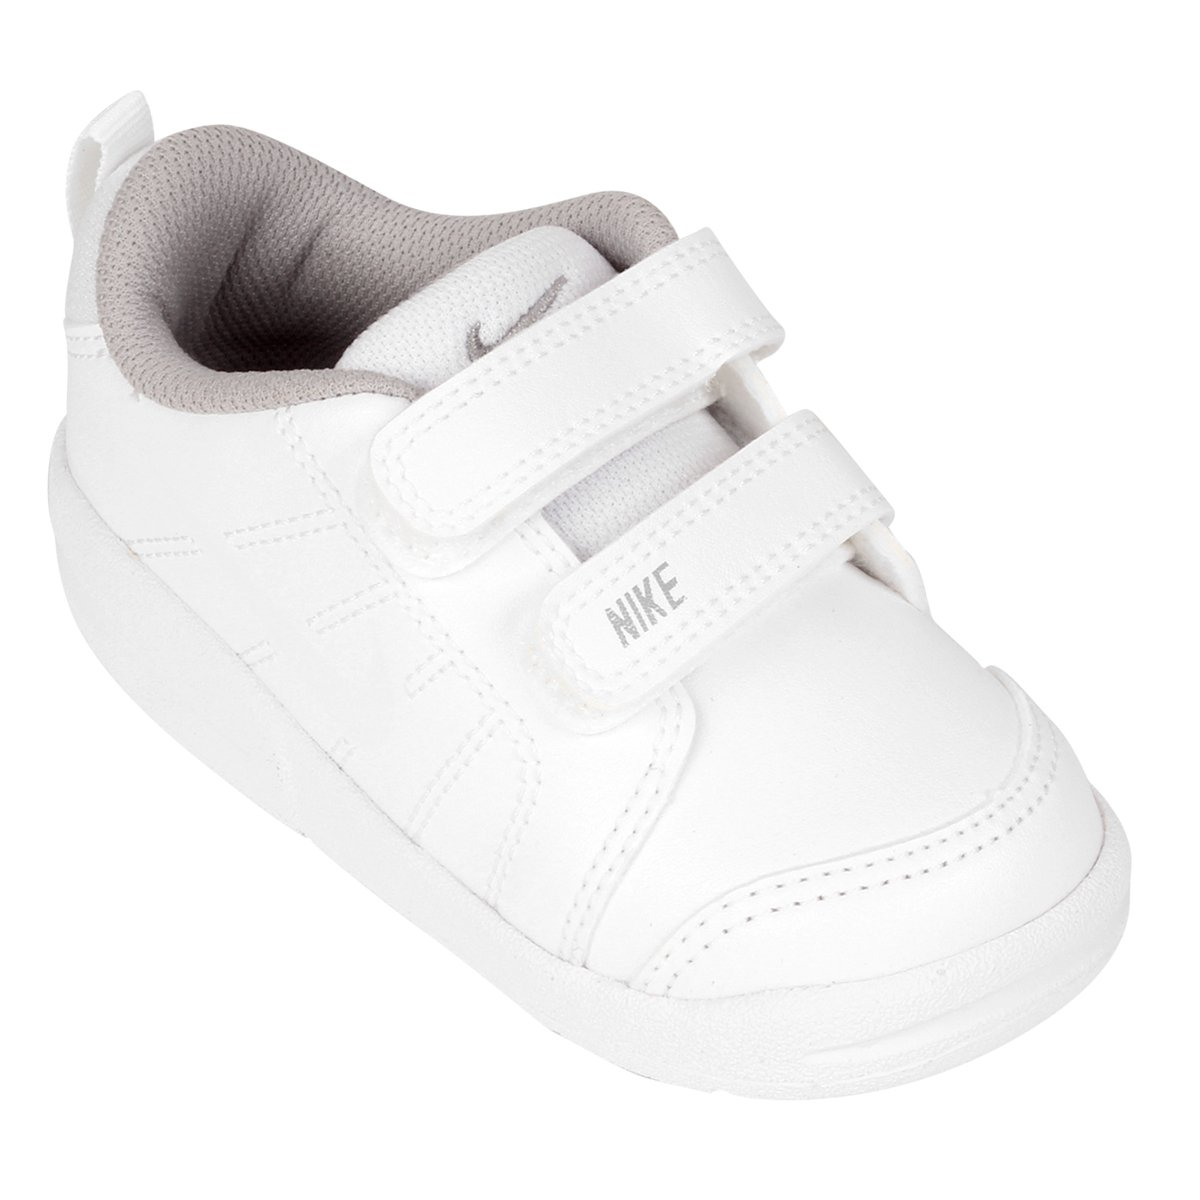 871ebeeb7 Tênis Infantil Nike Pico Lt Masculino - Branco e Cinza - Compre Agora